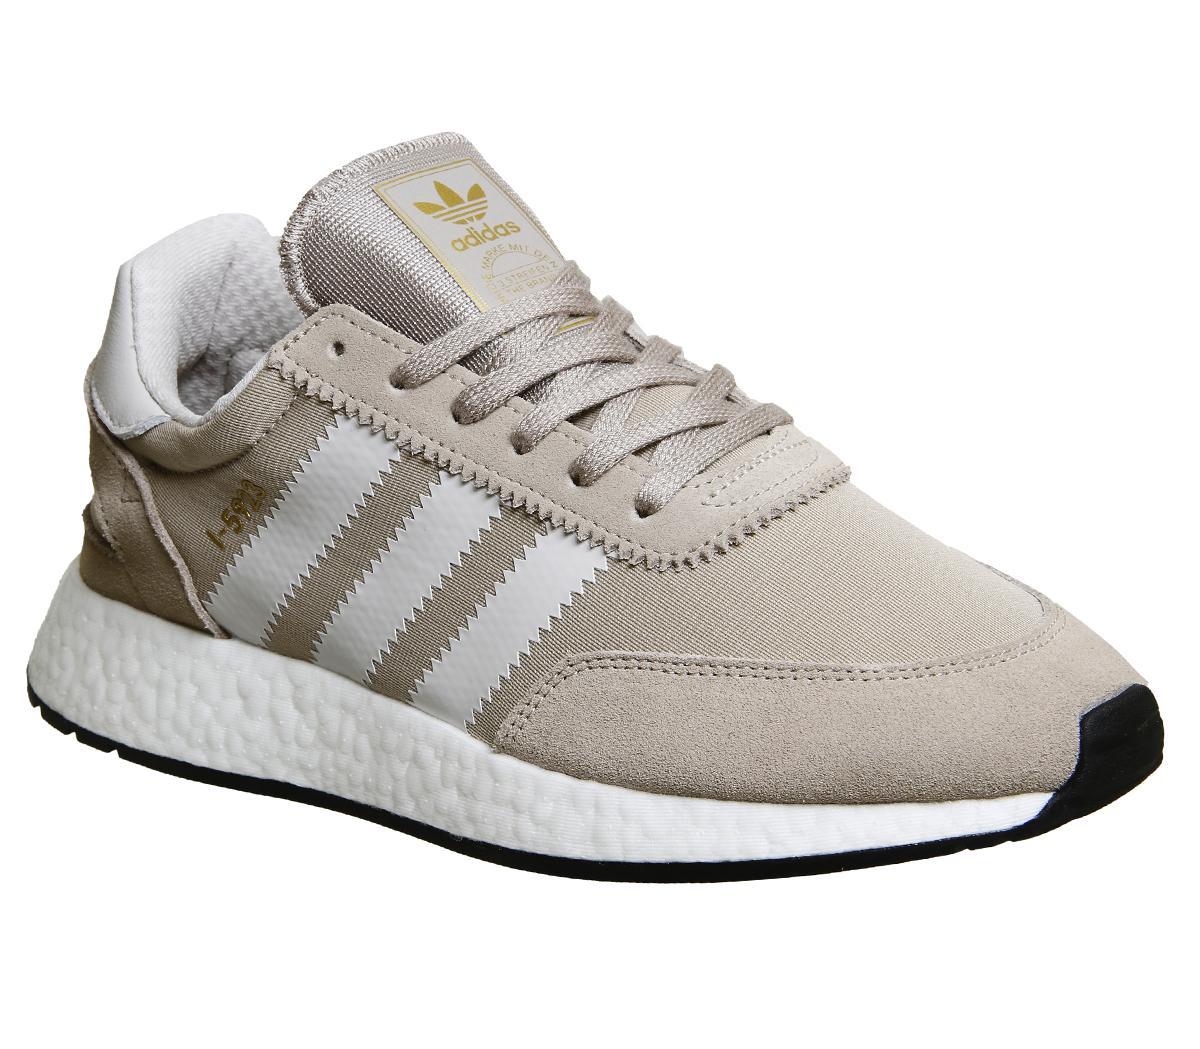 Chalk Grey Sneaker Adidas Damen Vapour 5923 I WDHY2IE9